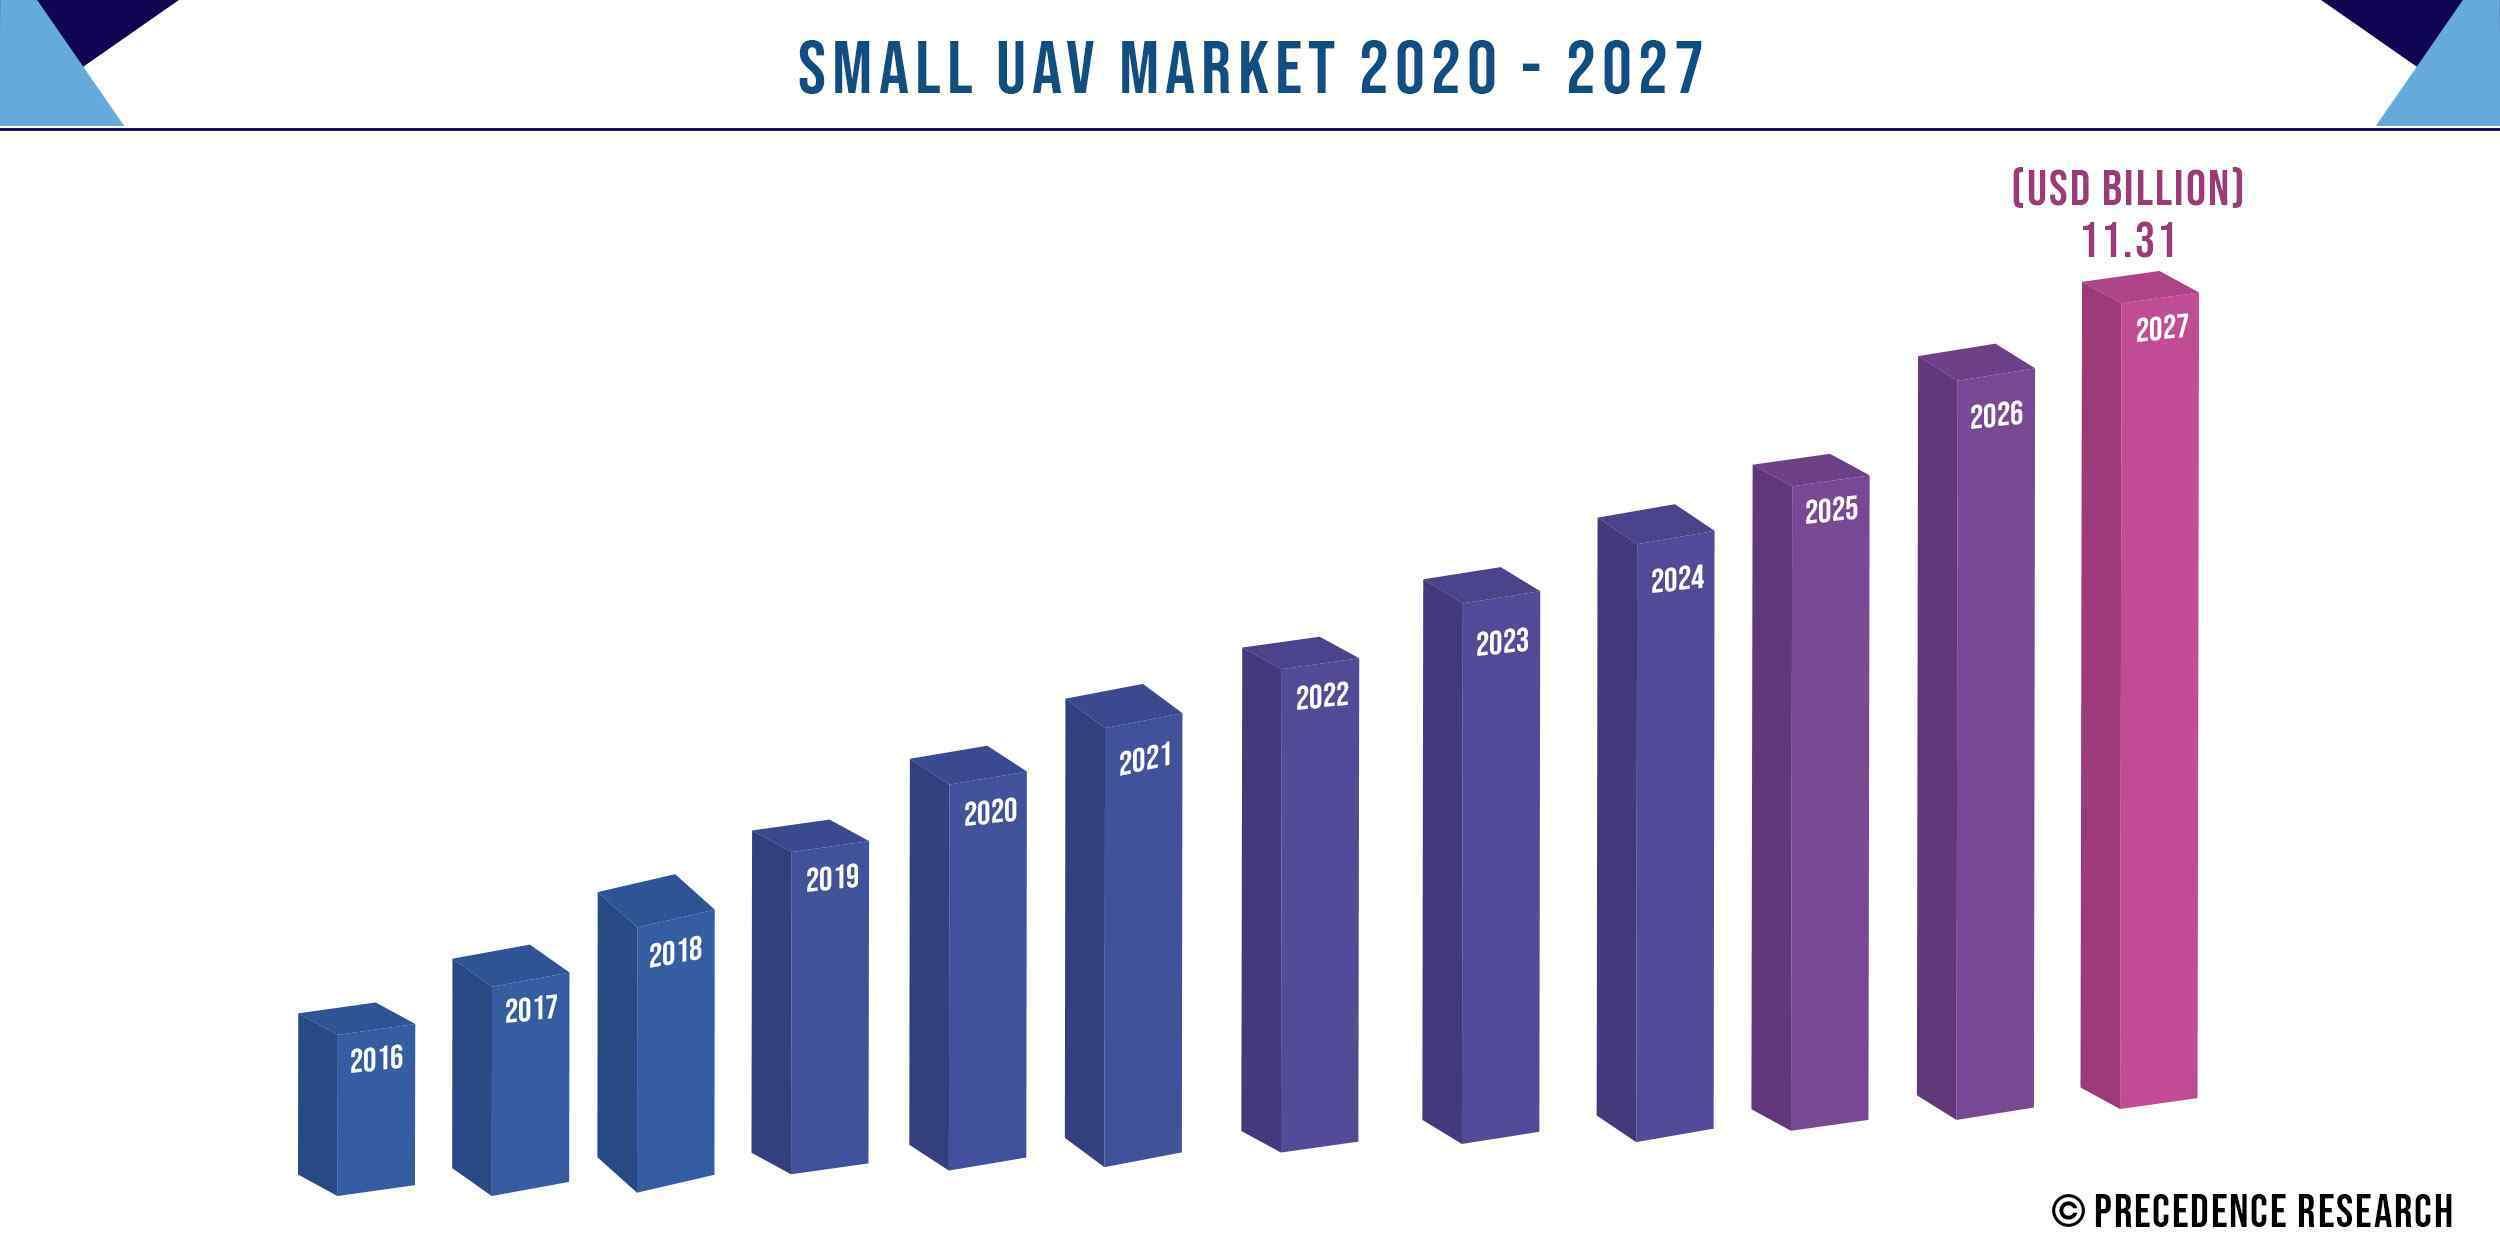 Small UAV Market Size 2016 to 2027